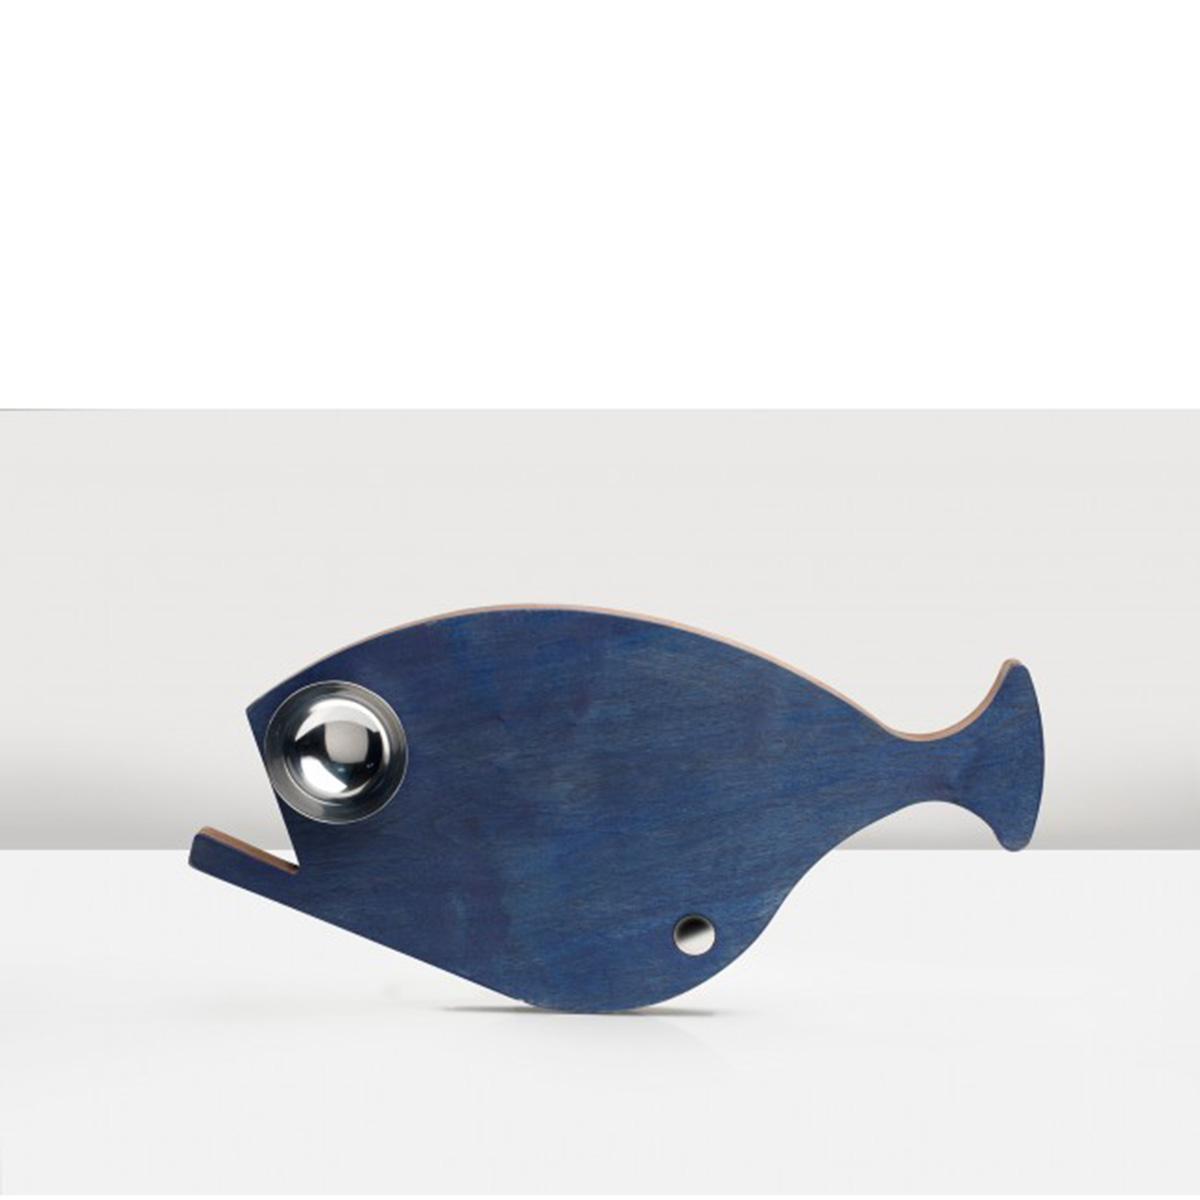 Tagliere Bluefish